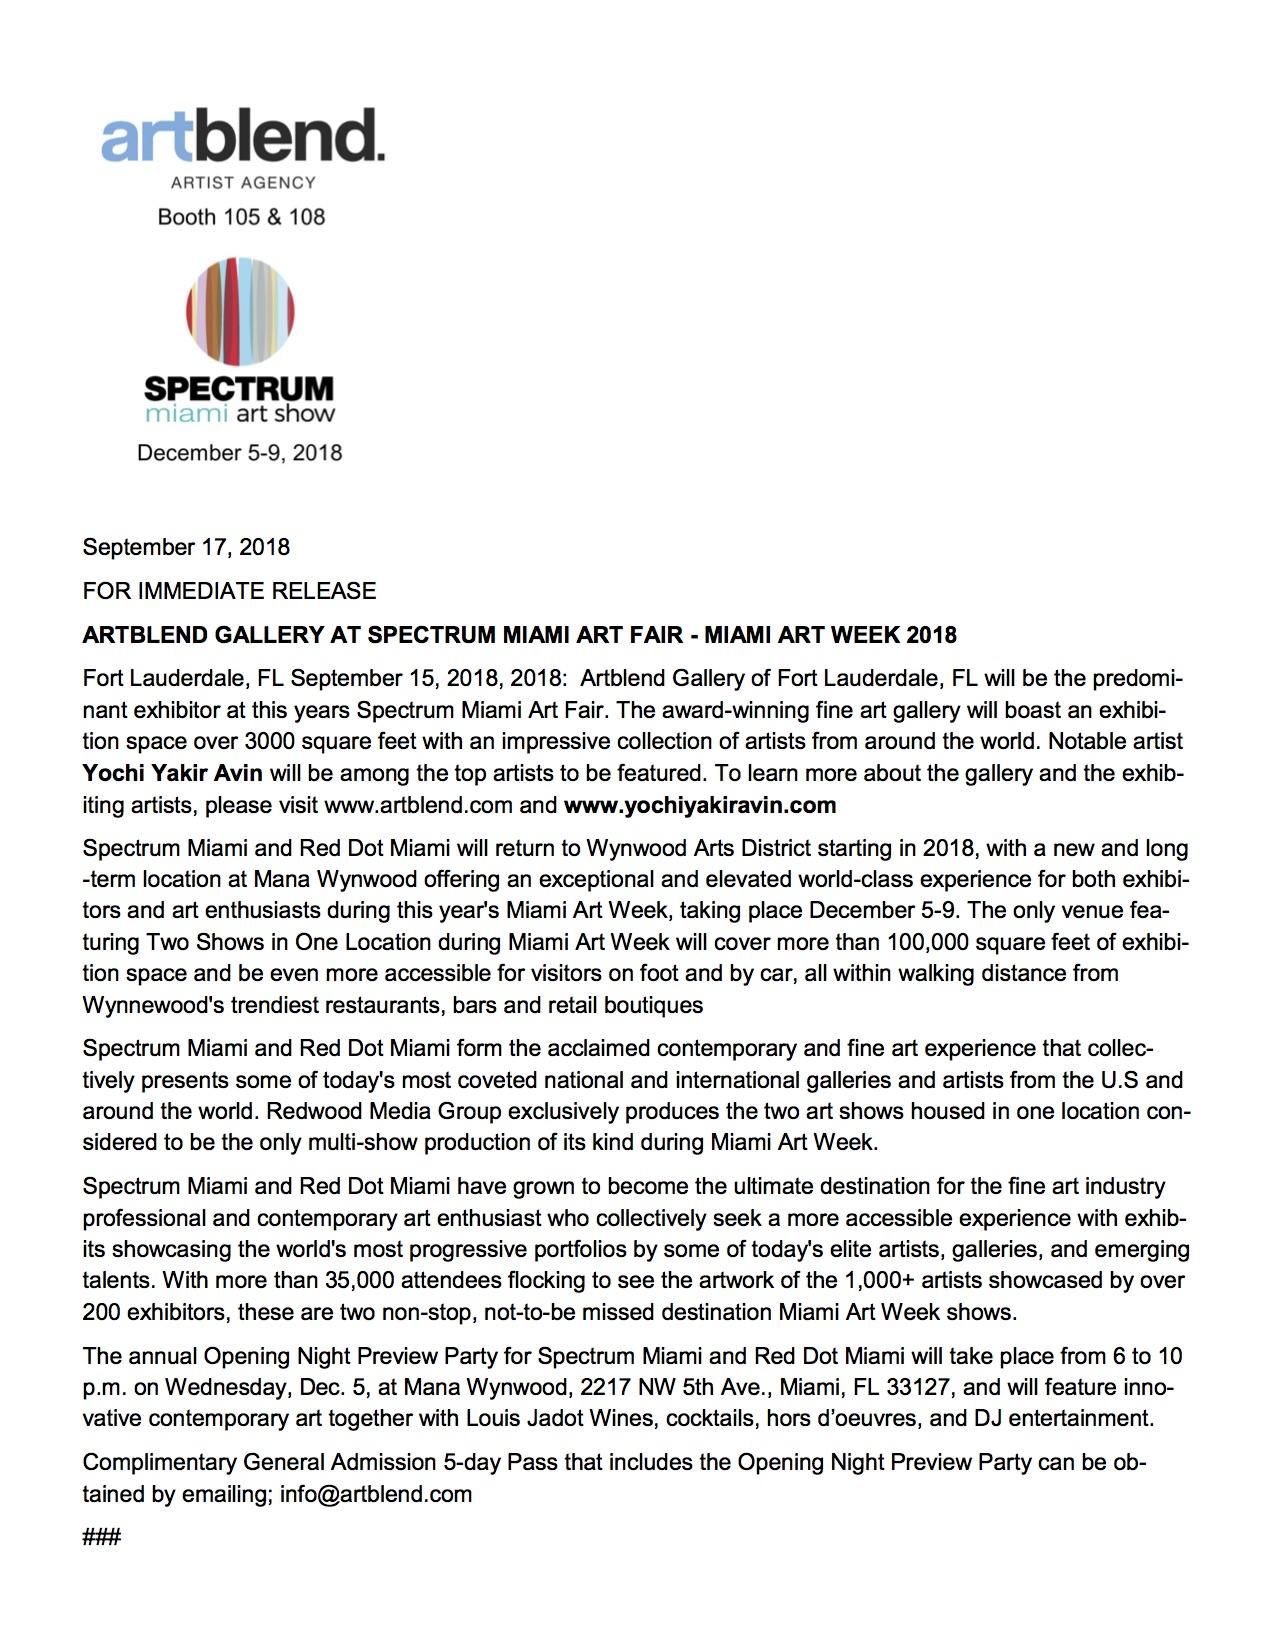 ARTBLEND SM18 PRESS RELEASE Yochi Yakir